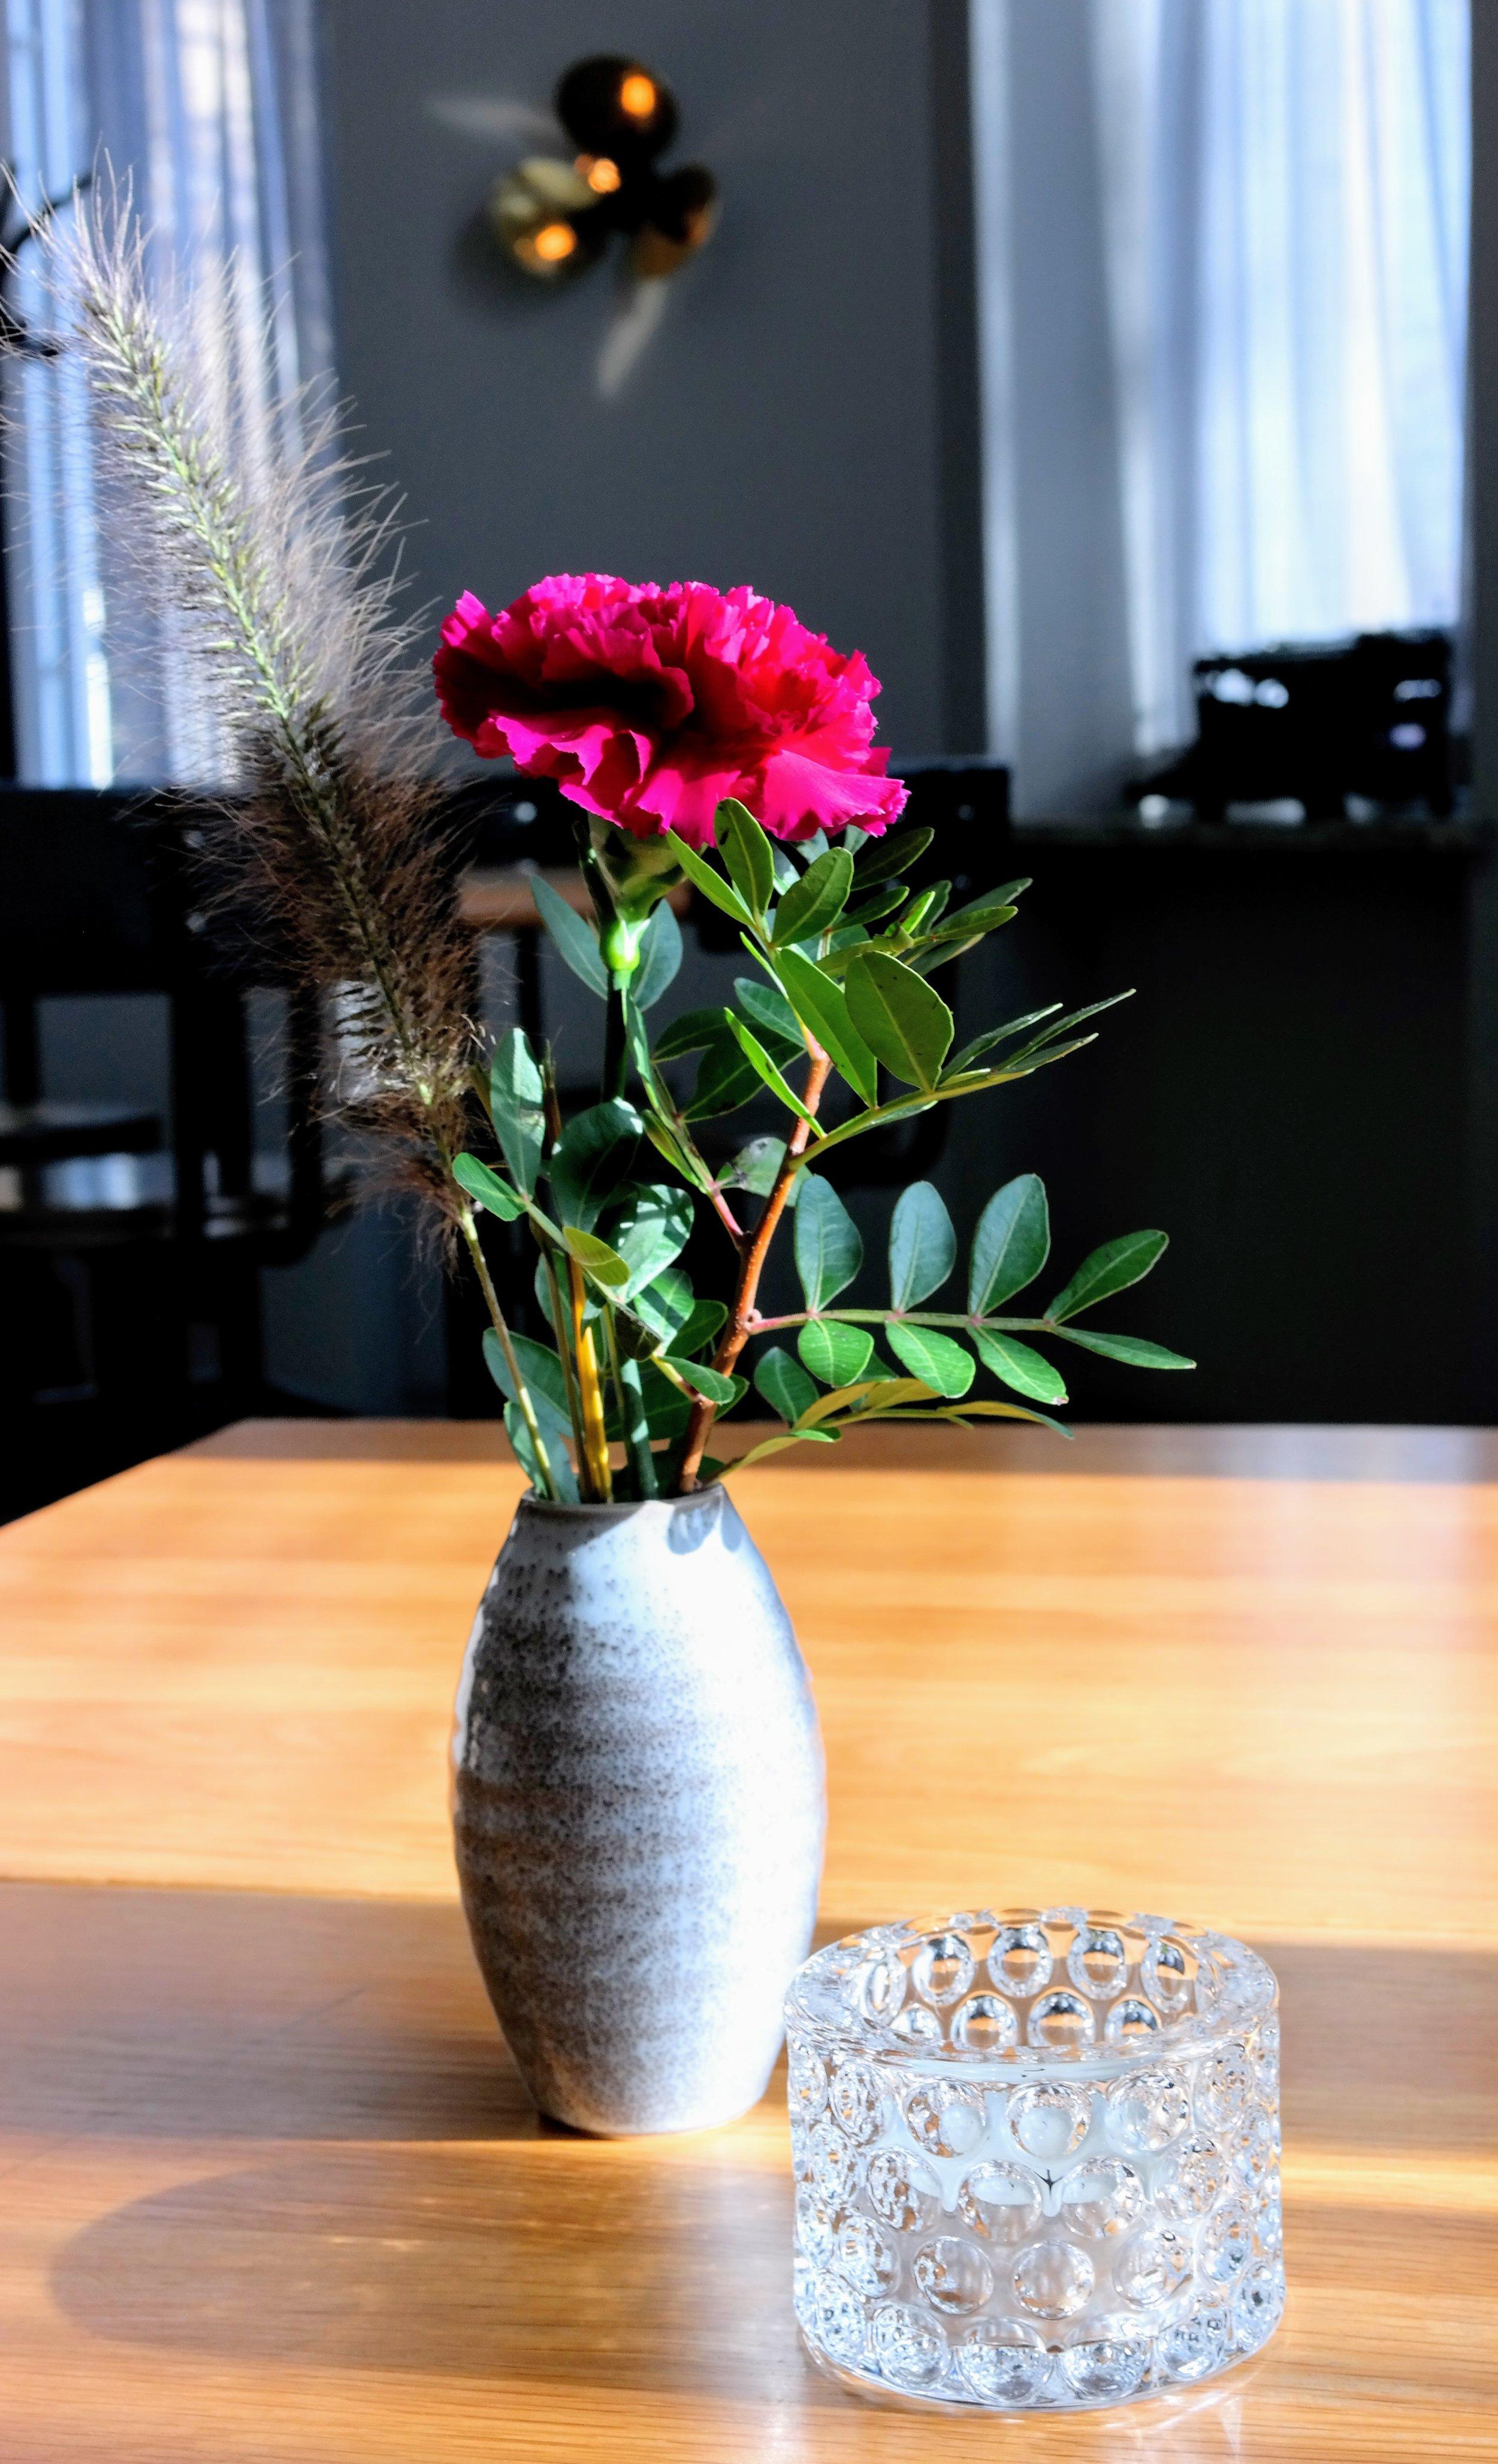 Blommig dekoration på bordet